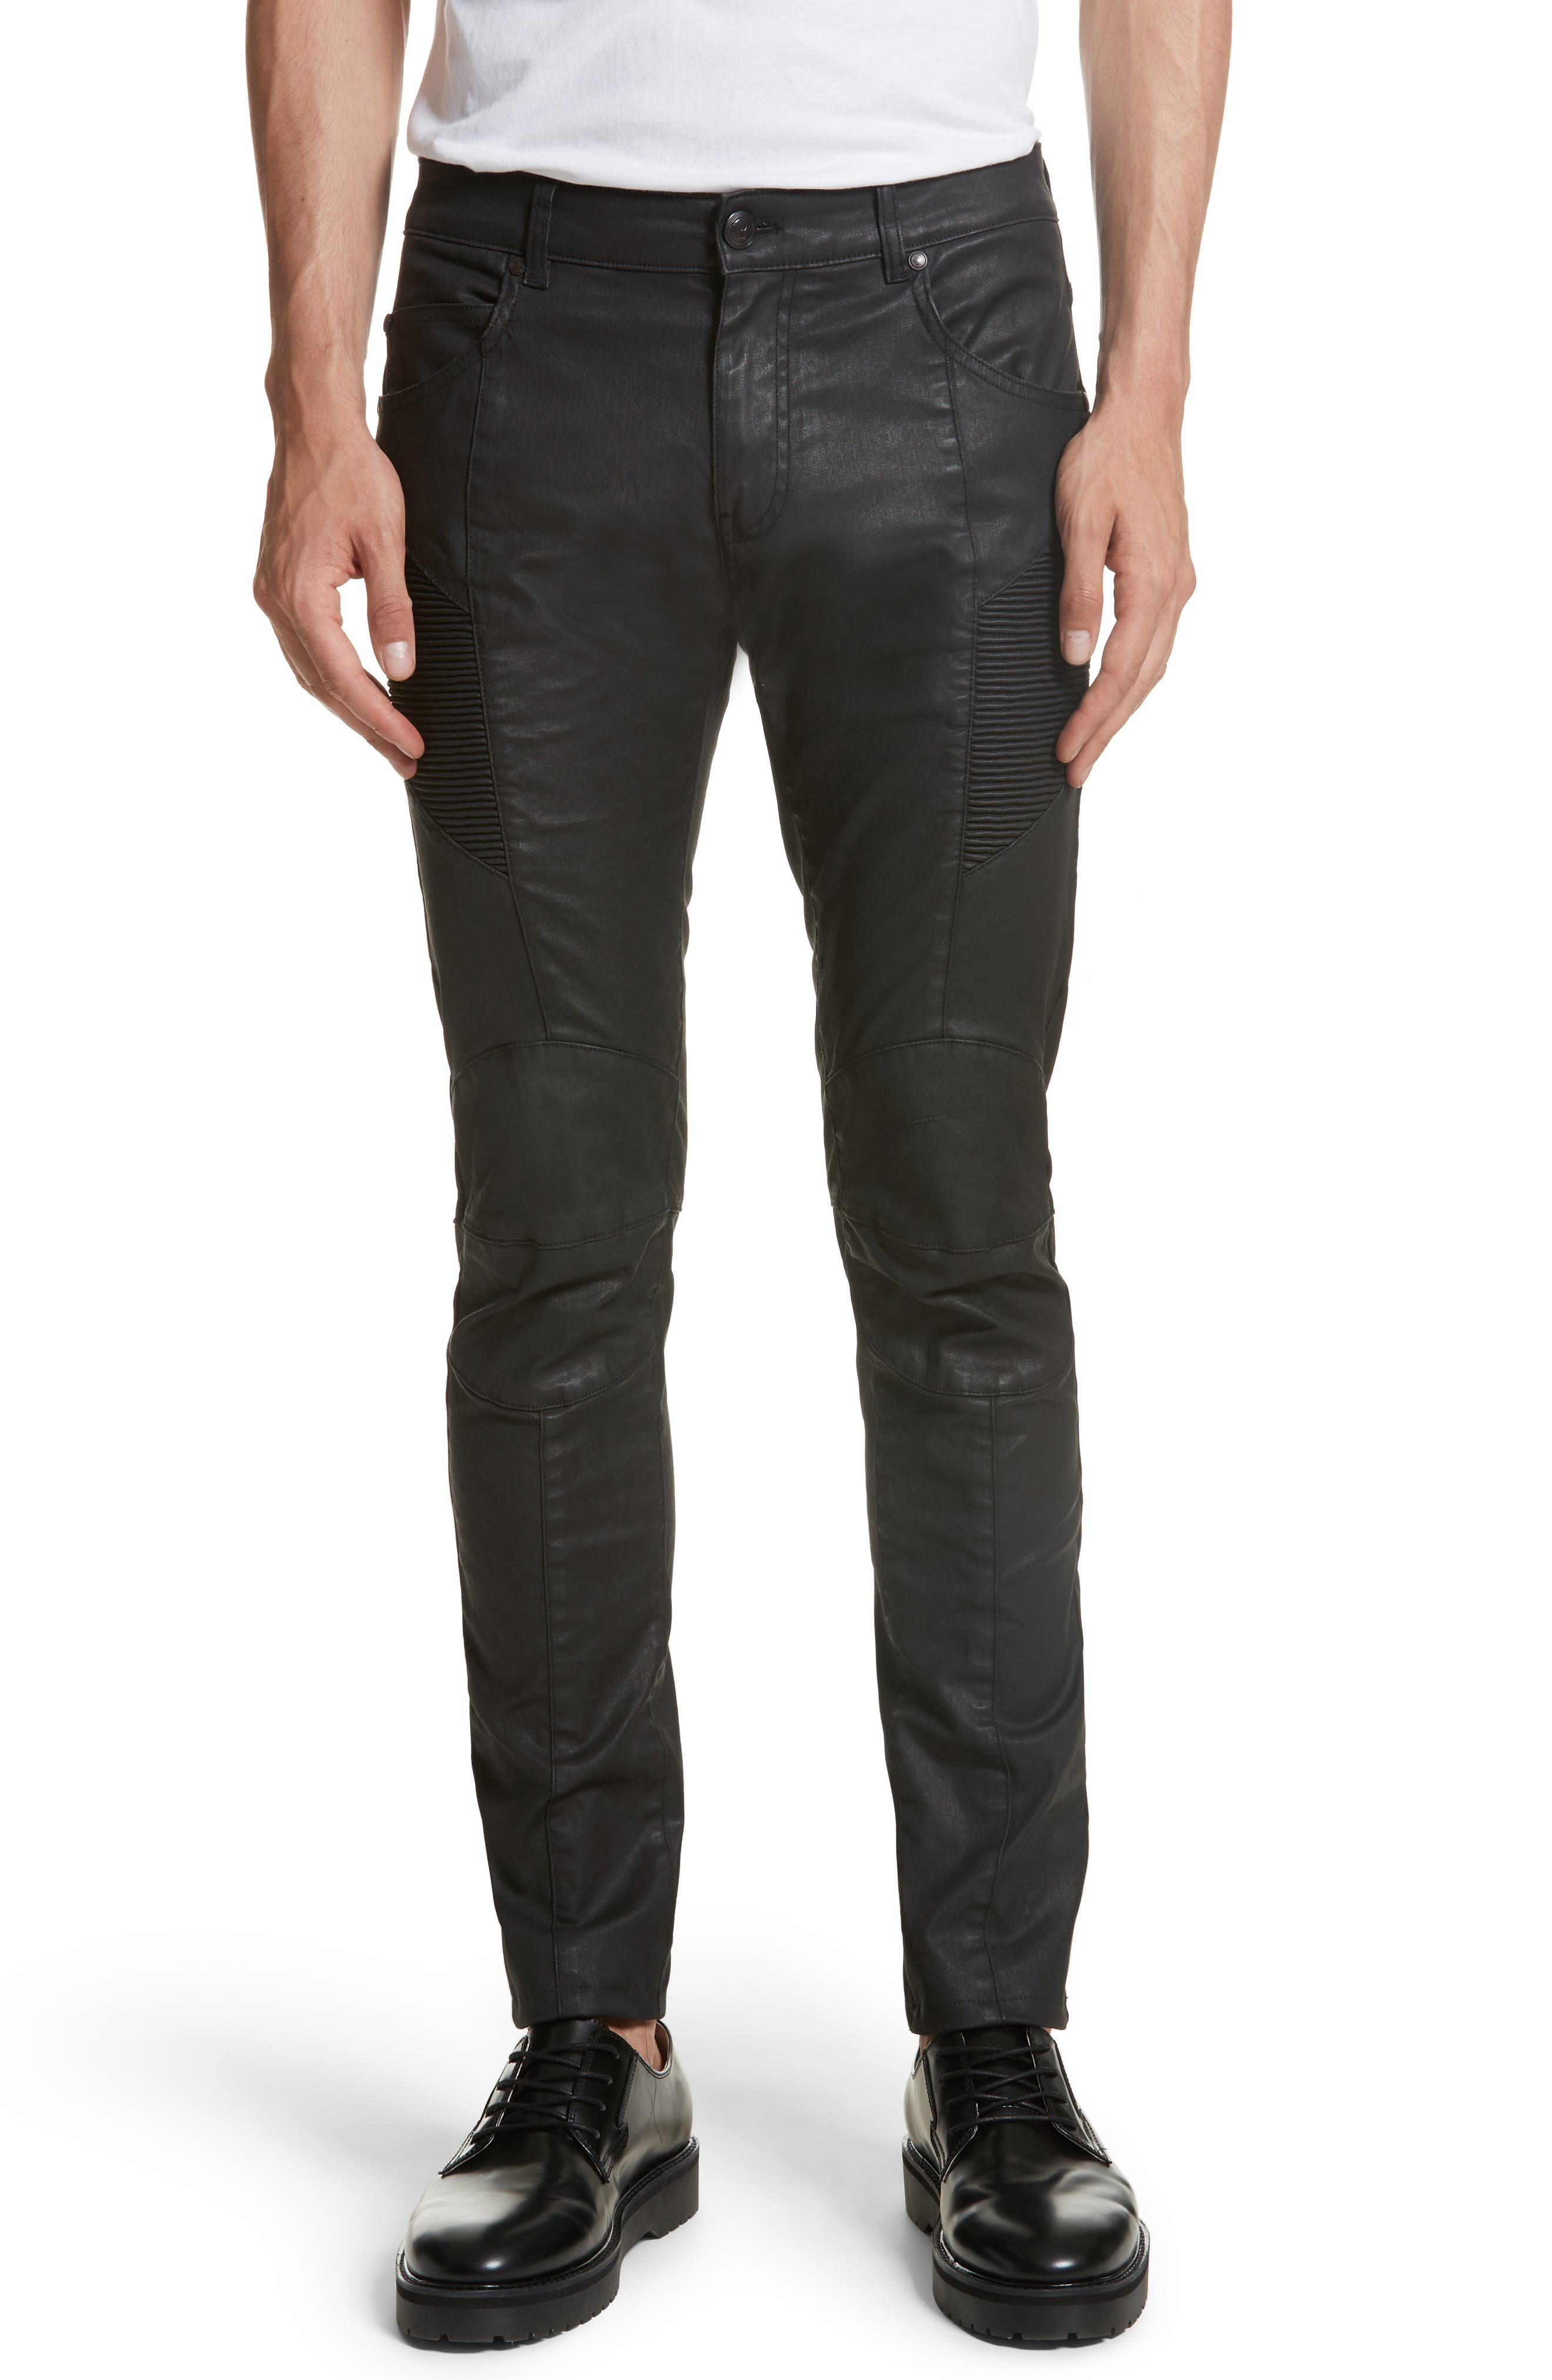 Alternate Image 1 Selected - Pierre Balmain Core Coated Moto Jeans